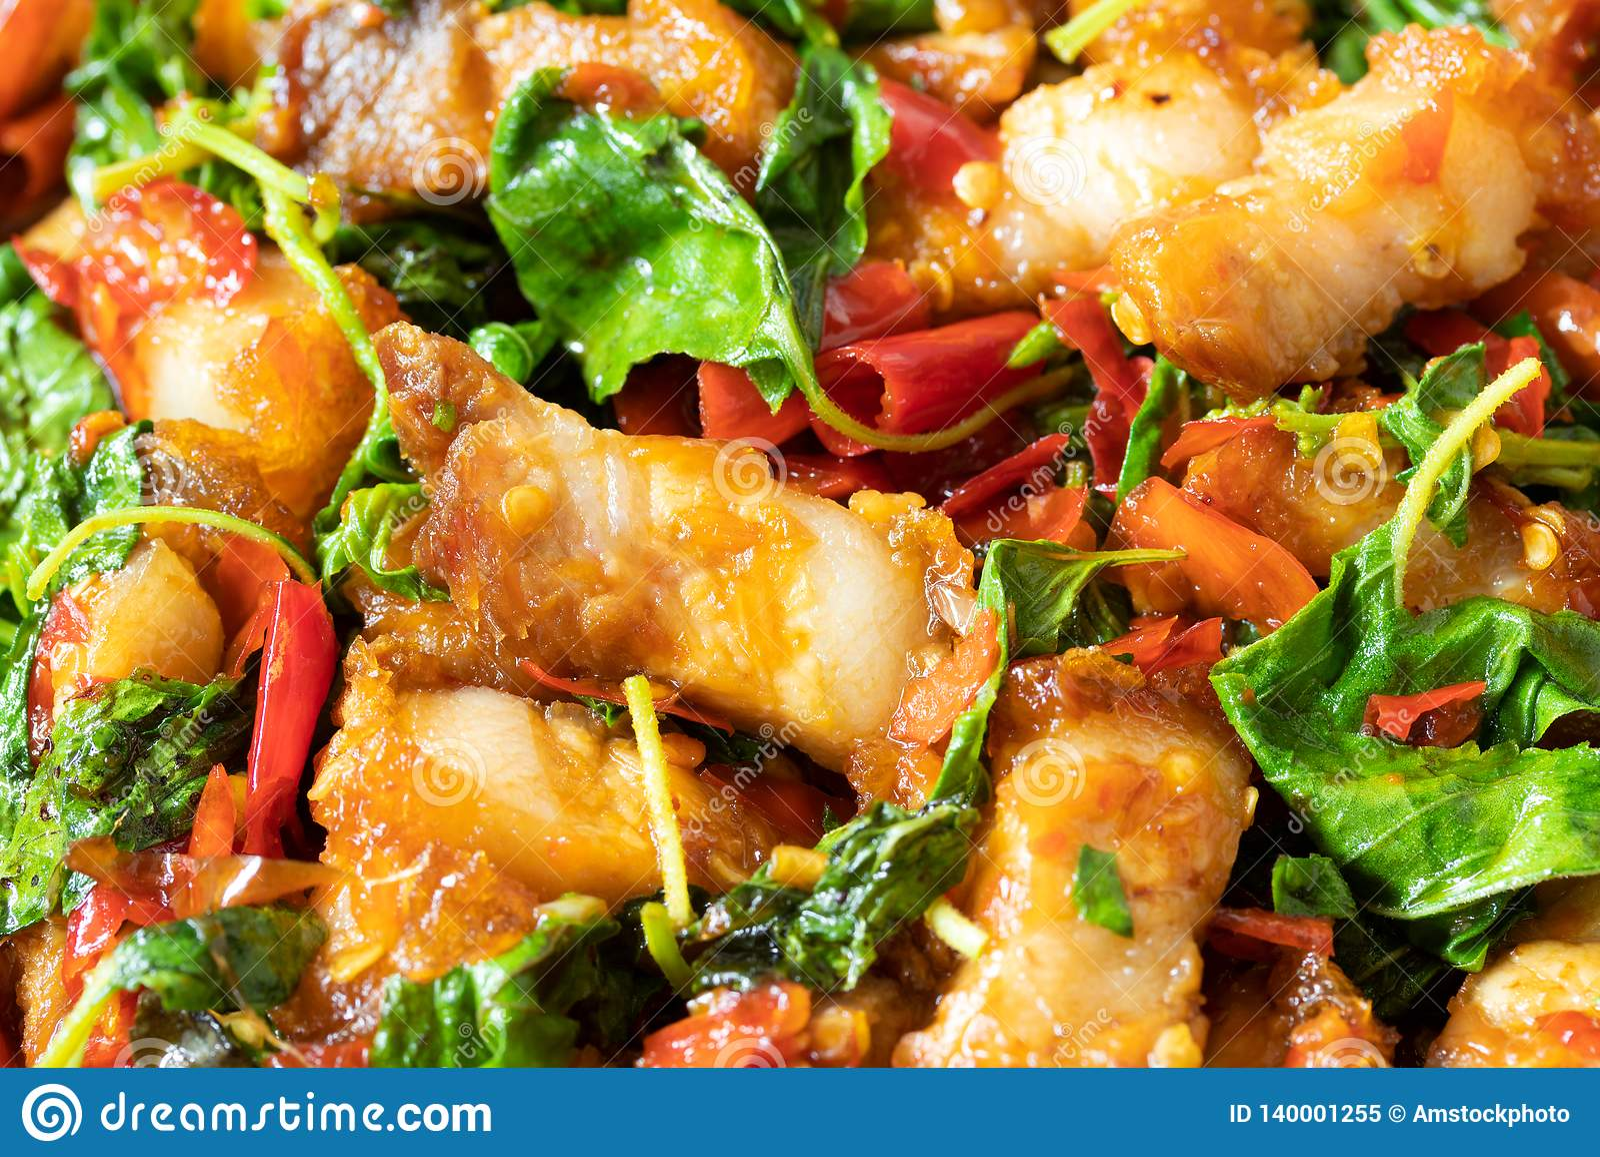 Close up of stir fried crispy pork with holy basil, thai food